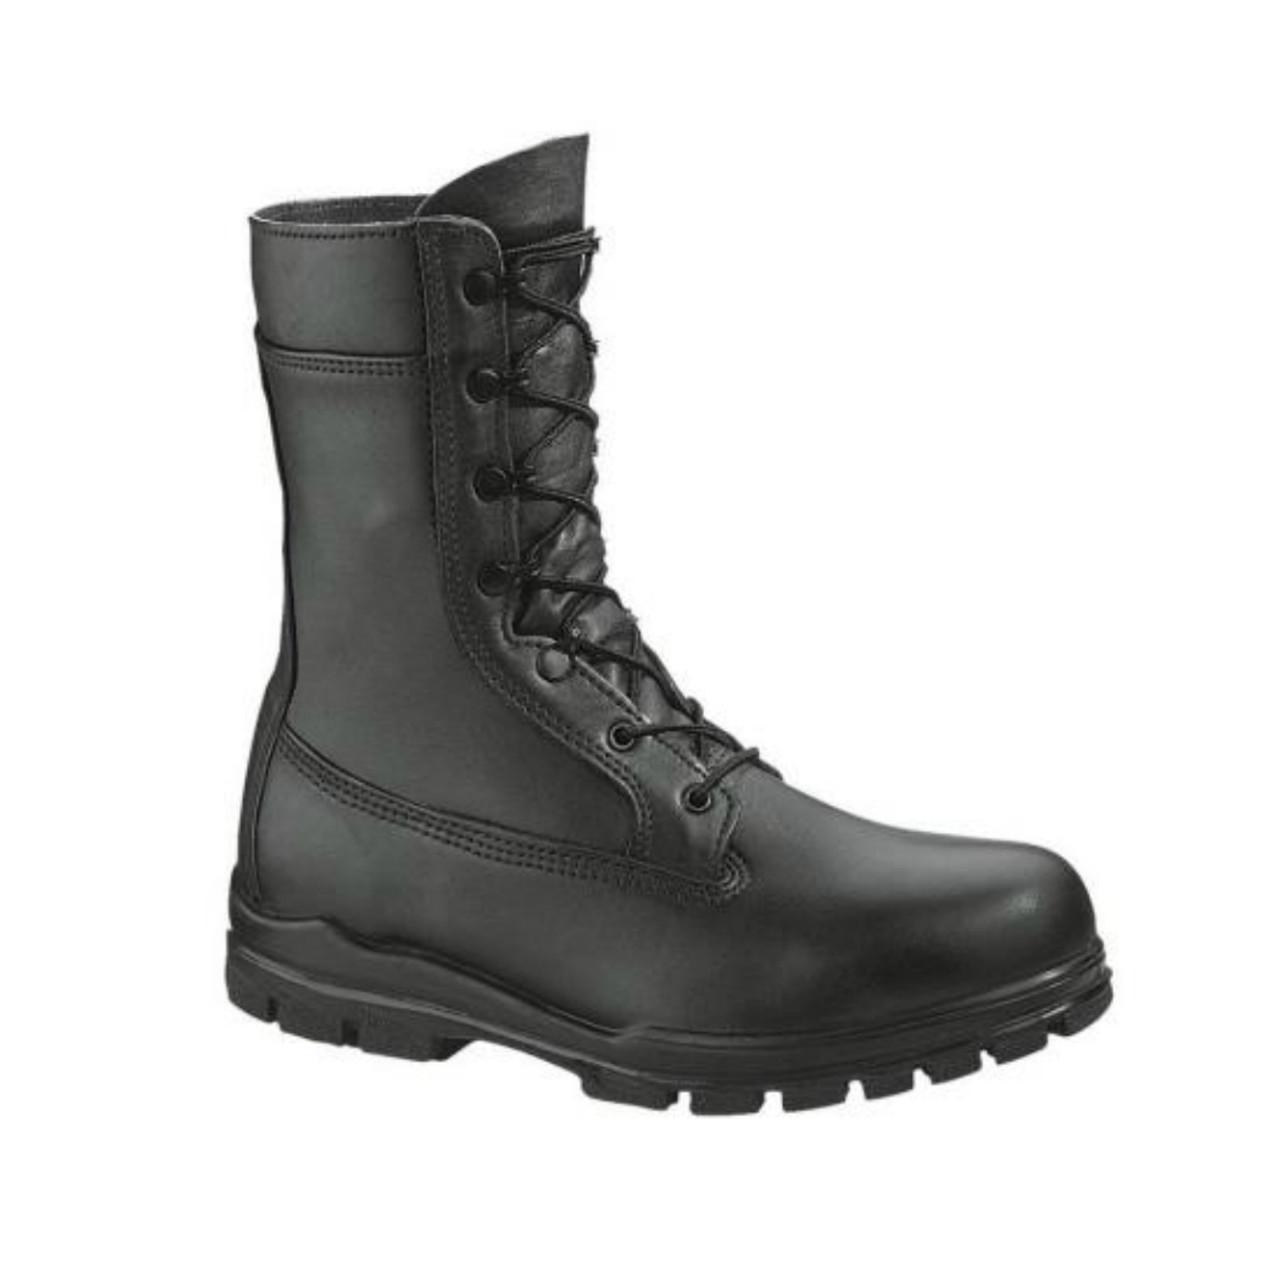 d01a2bbf0ac Bates 1621 Mens 9 Inch US Navy Durashocks Steel Toe Boot